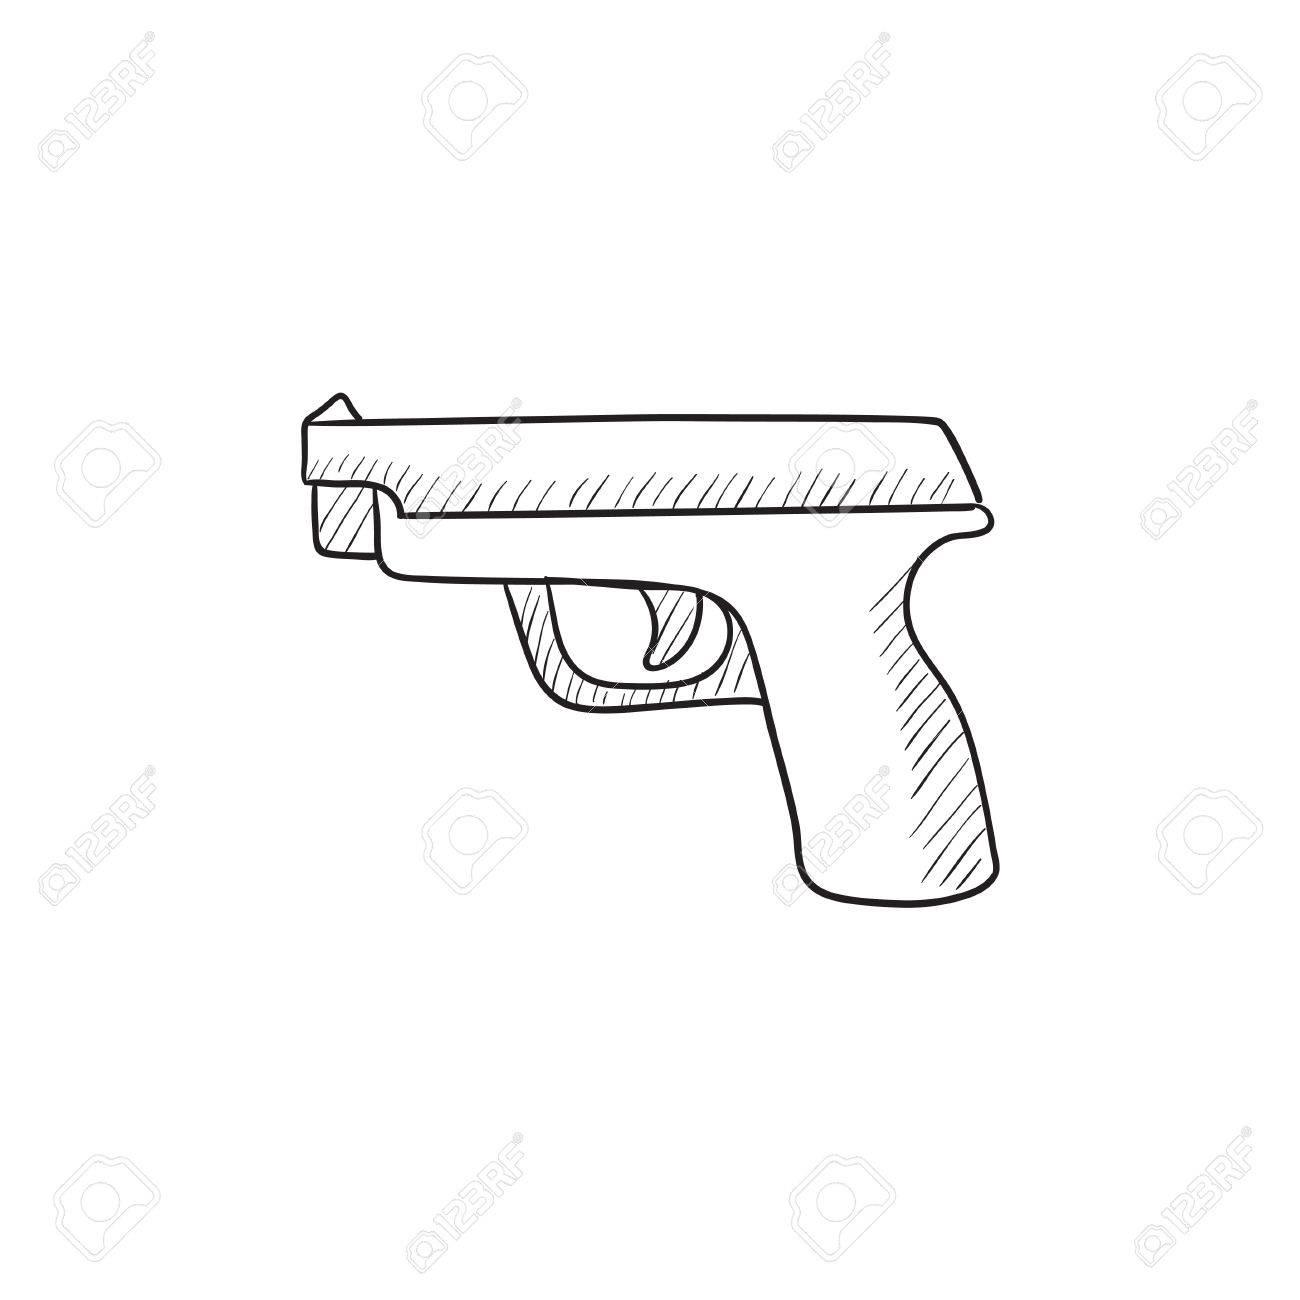 1300x1300 Handgun Vector Sketch Icon Isolated On Background. Hand Drawn